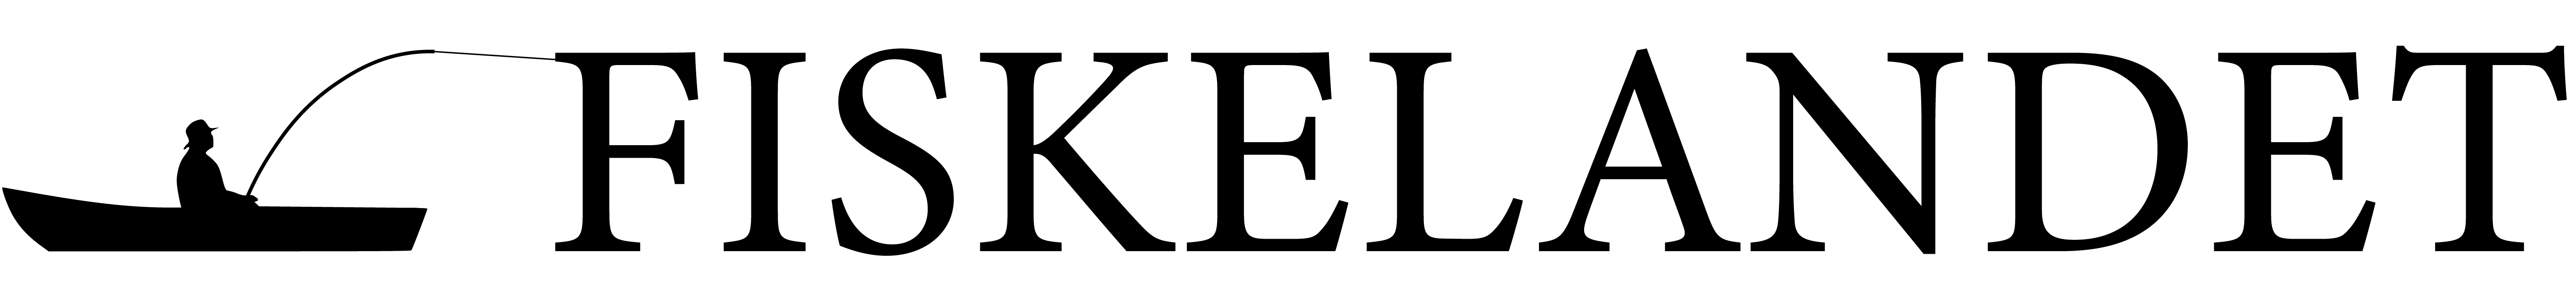 Xiha-dejting